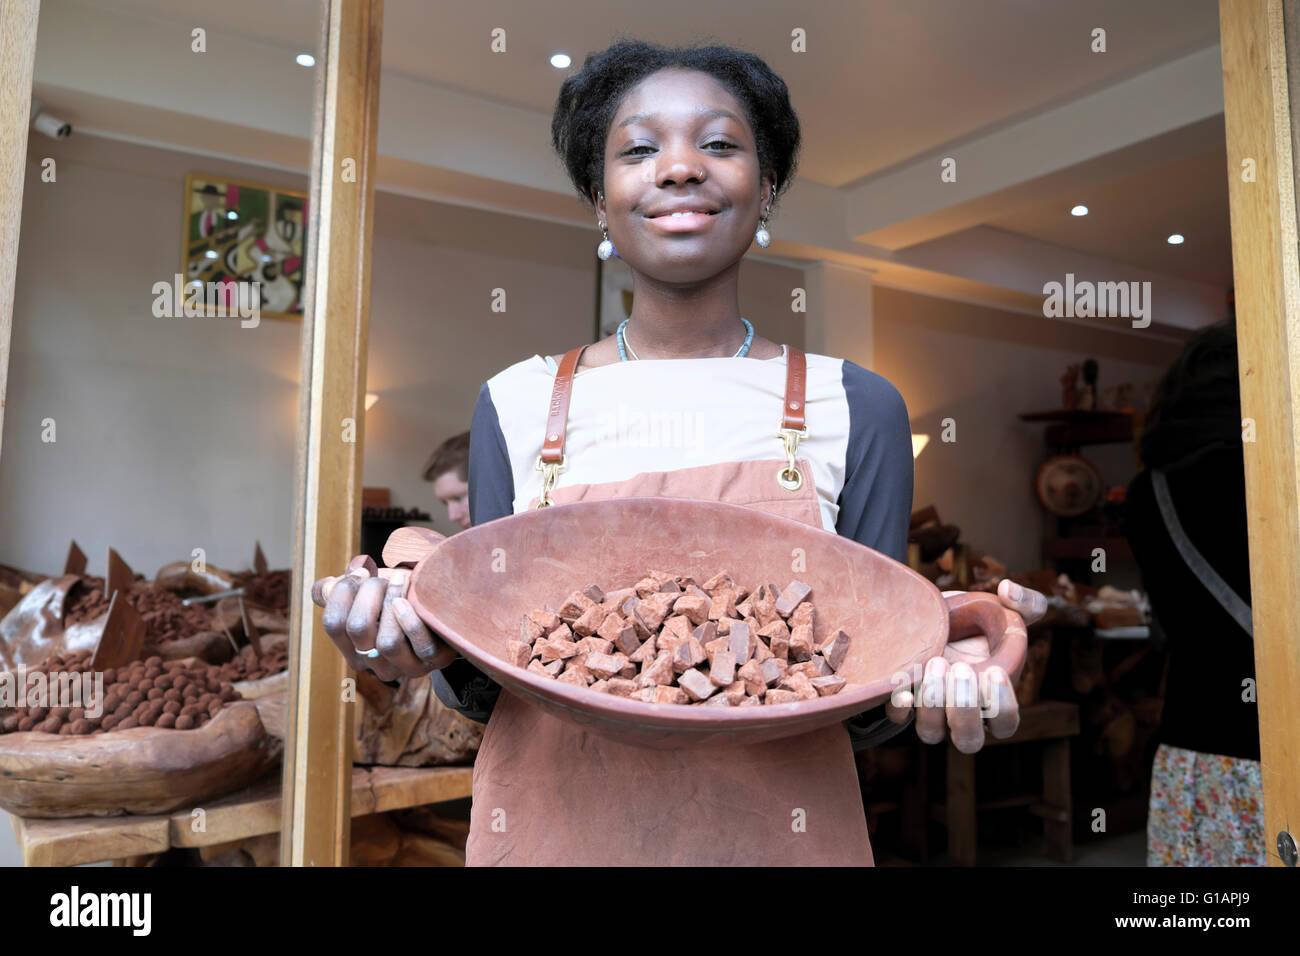 Young woman at Dark Sugar chocolate cocoa shop making handmade artisan chocolates in Brick Lane, East London UK - Stock Image